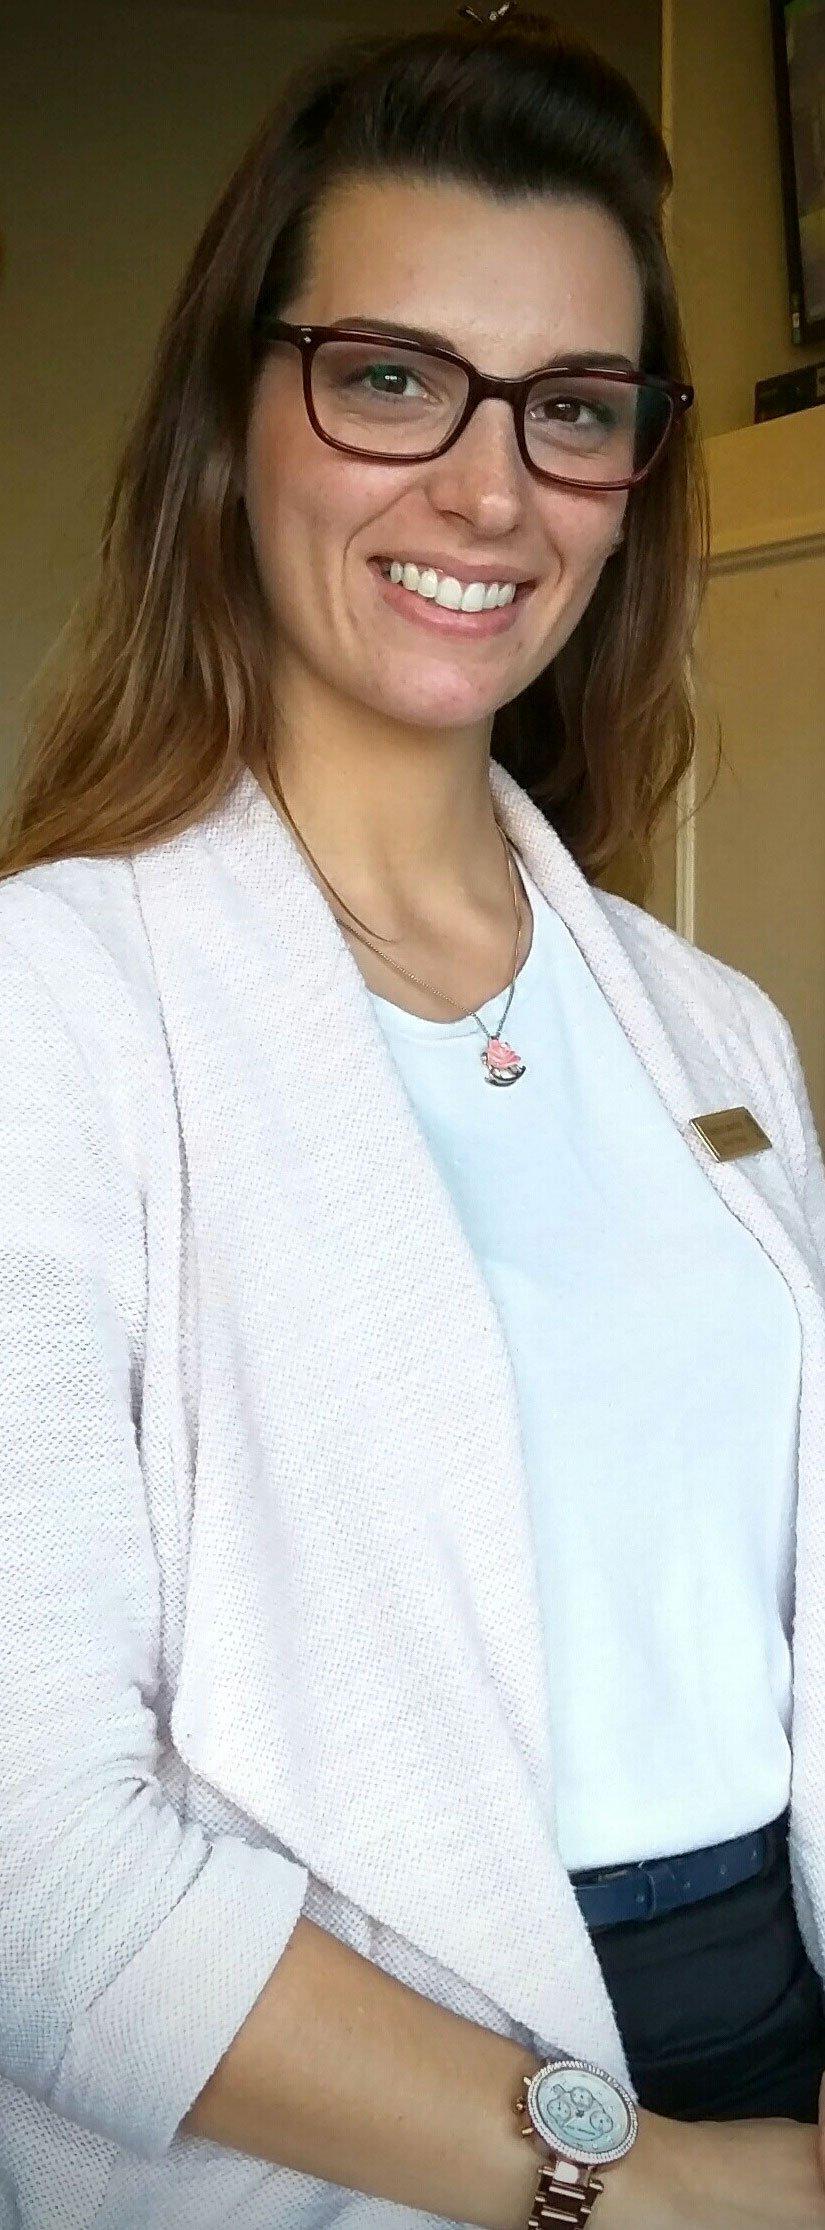 Sophia Lawrence - Thamesfield